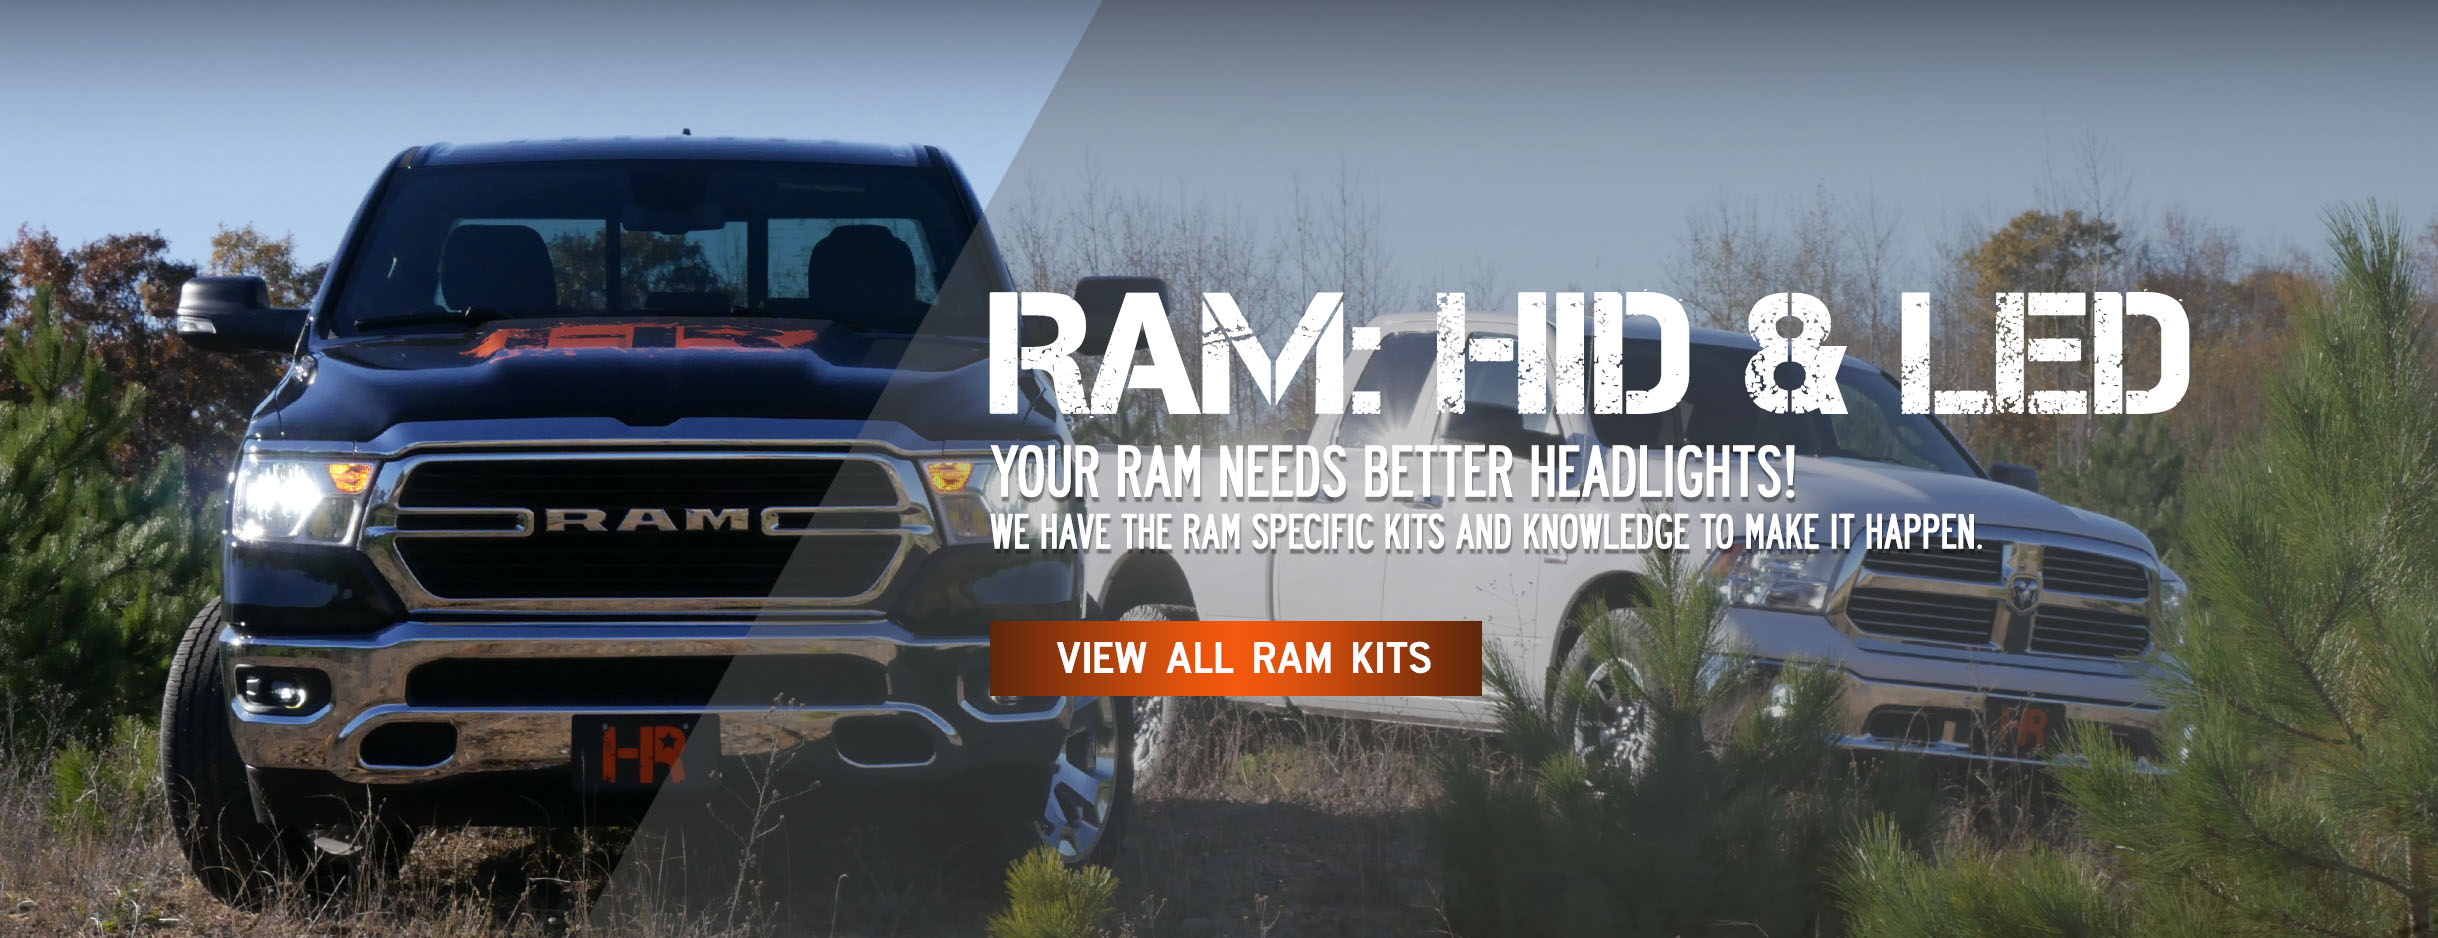 Ram HID and LED Headlights